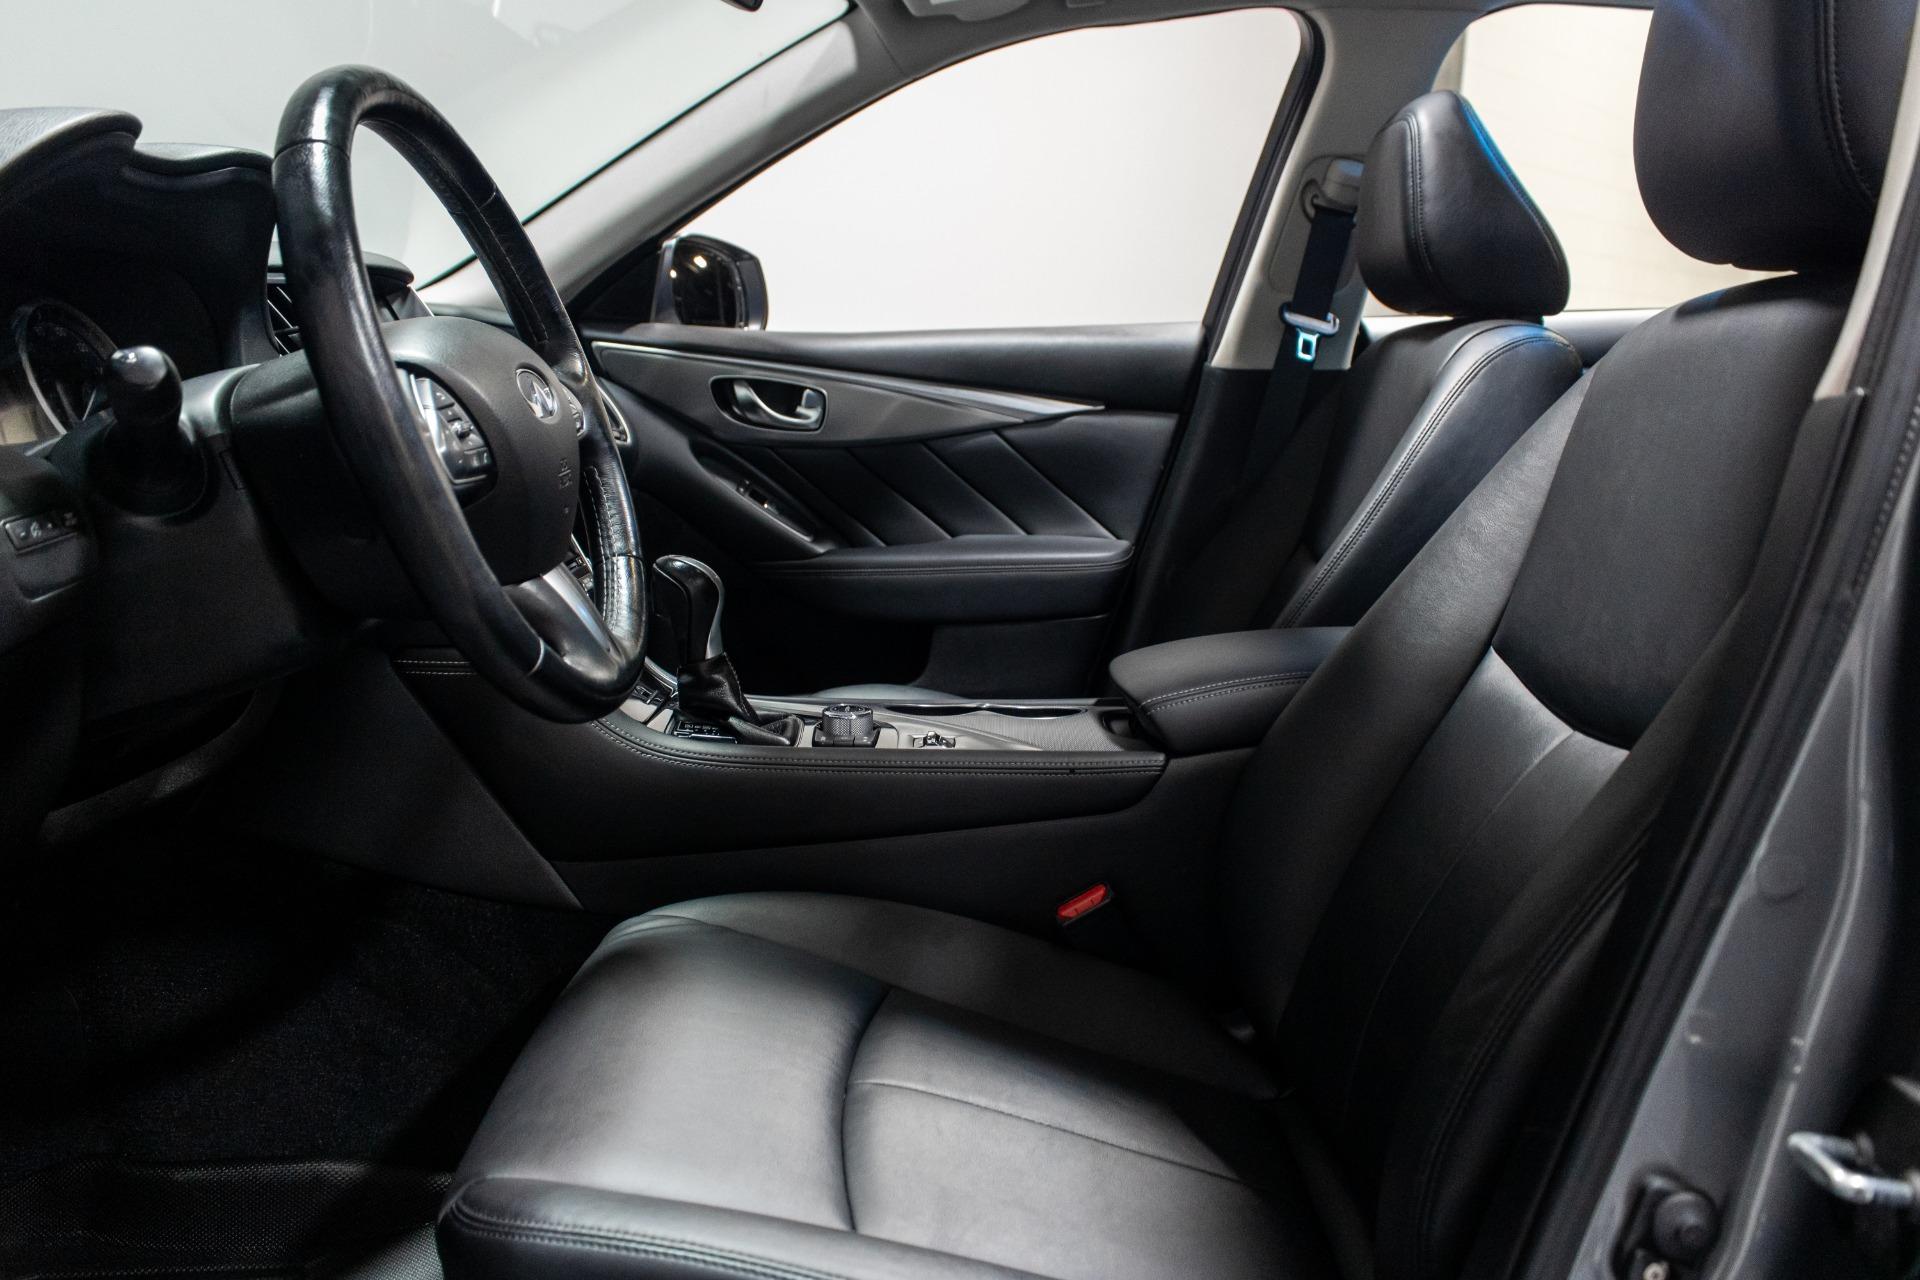 Used 2015 INFINITI Q50 Base AWD 4 Door